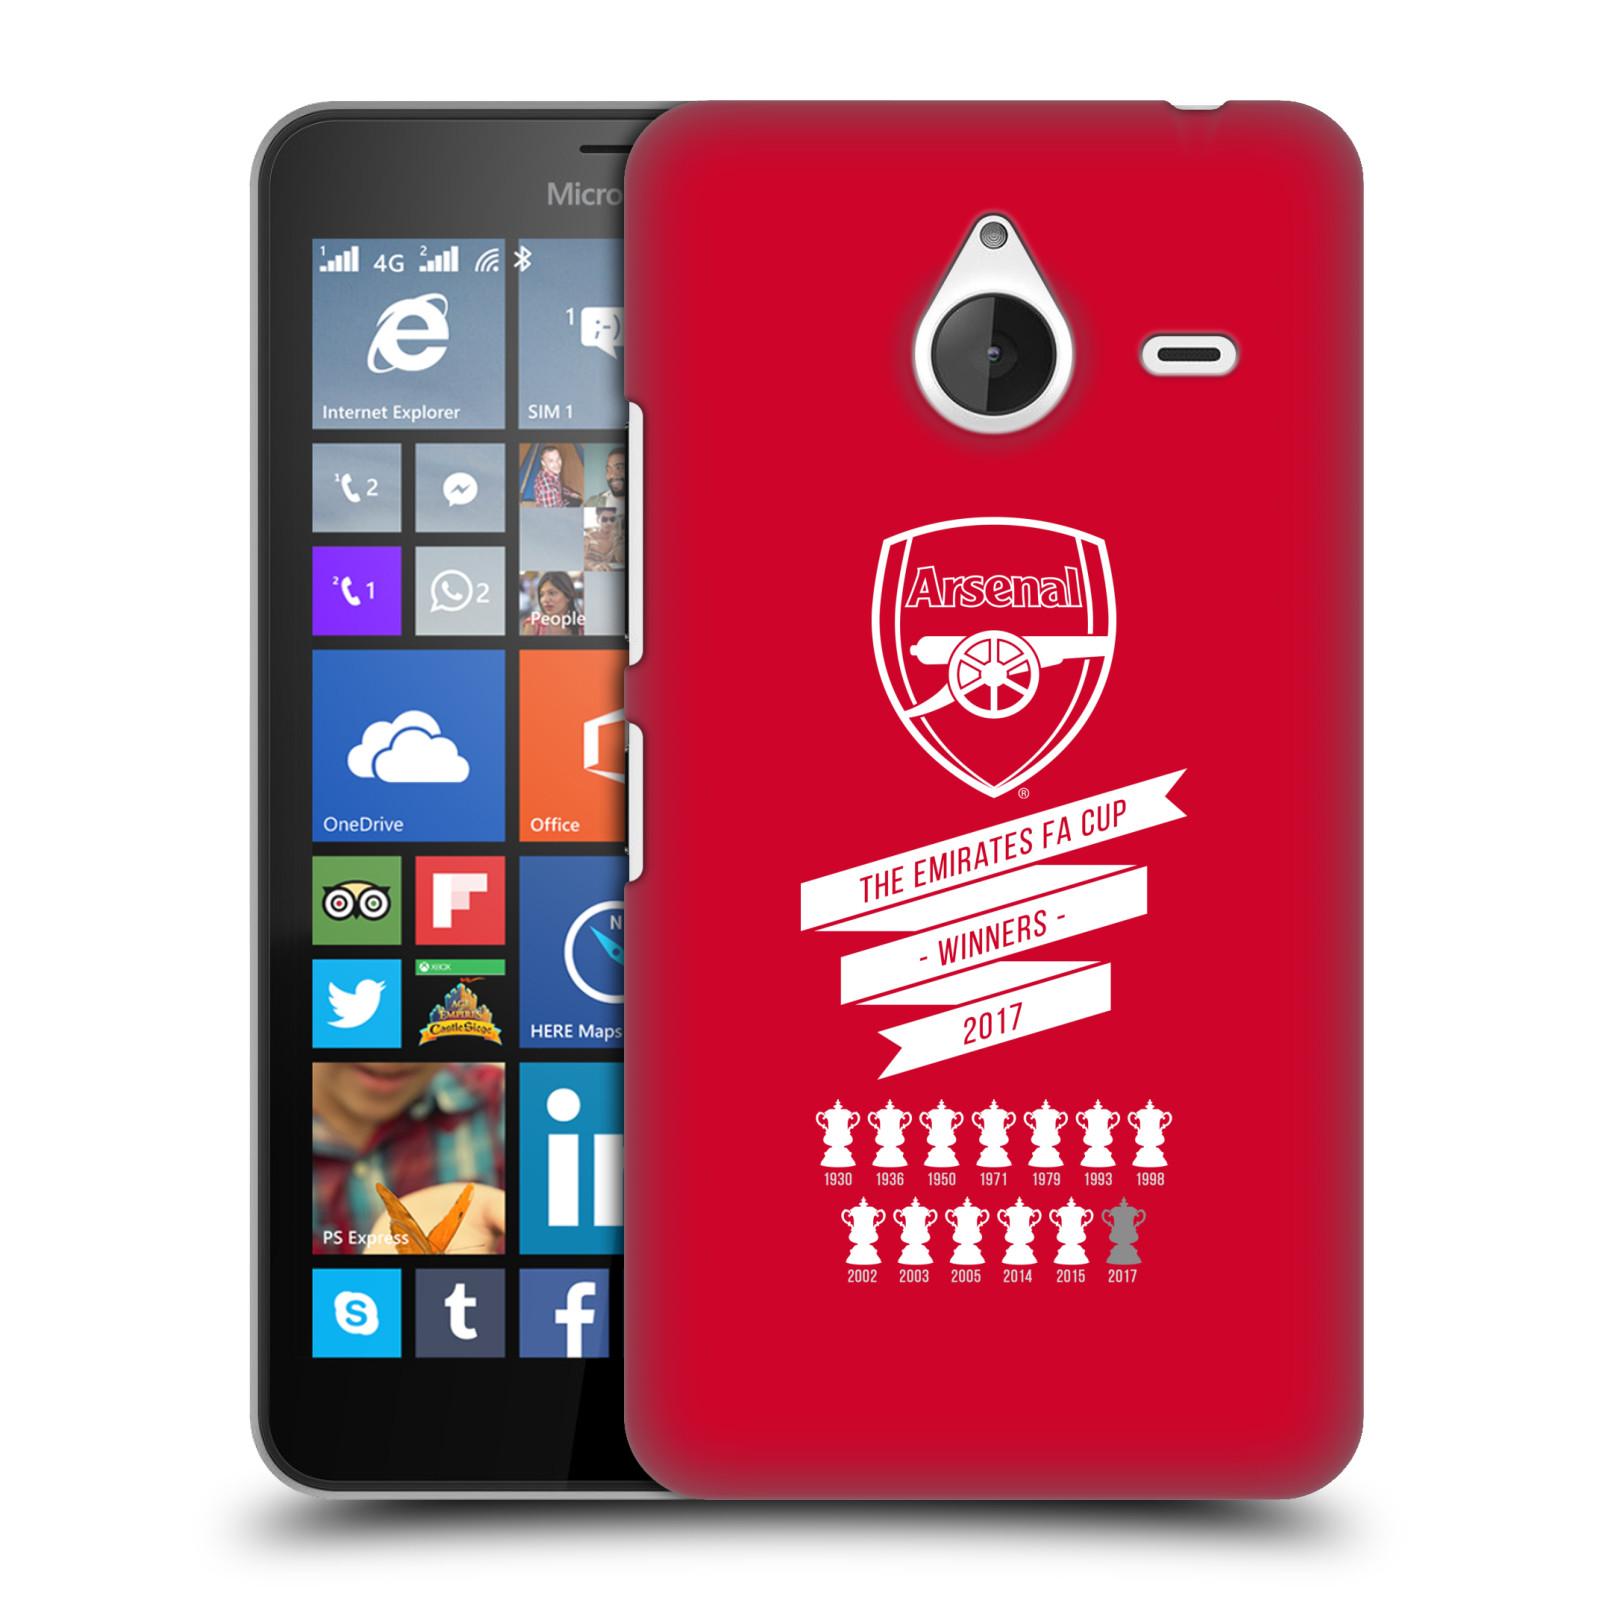 Plastové pouzdro na mobil Microsoft Lumia 640 XL - Head Case - Arsenal FC - 13 Wins